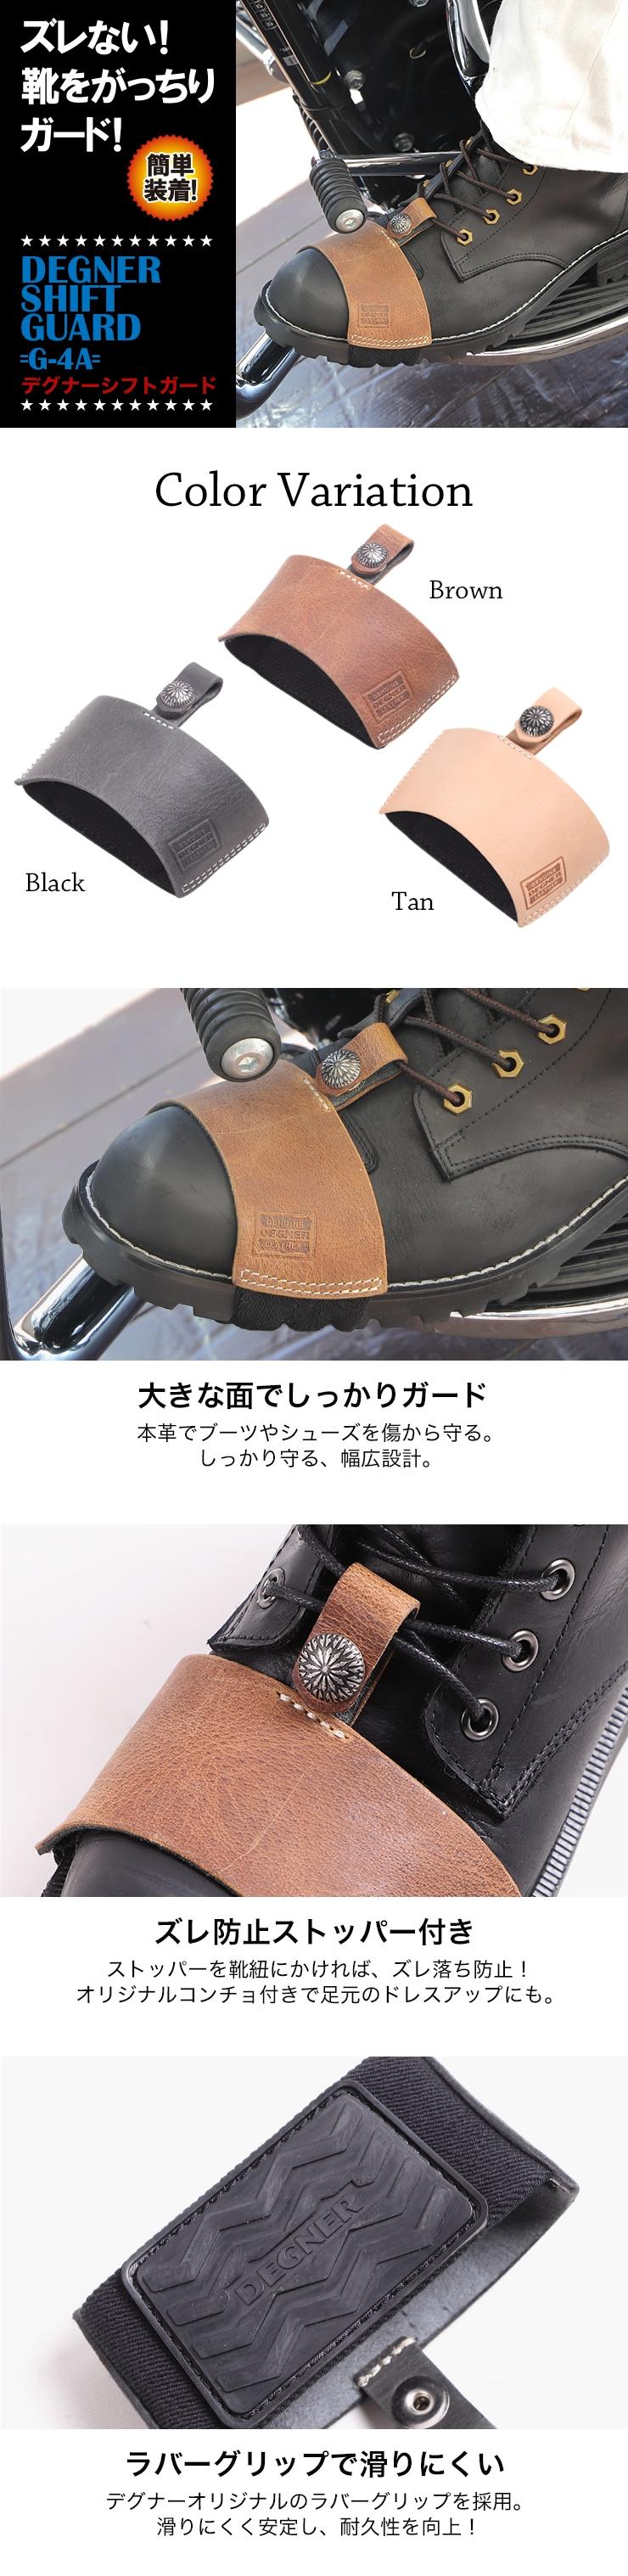 【DEGNER/デグナー】靴をがっちり!ズレない!本革シフトガード/G-4A